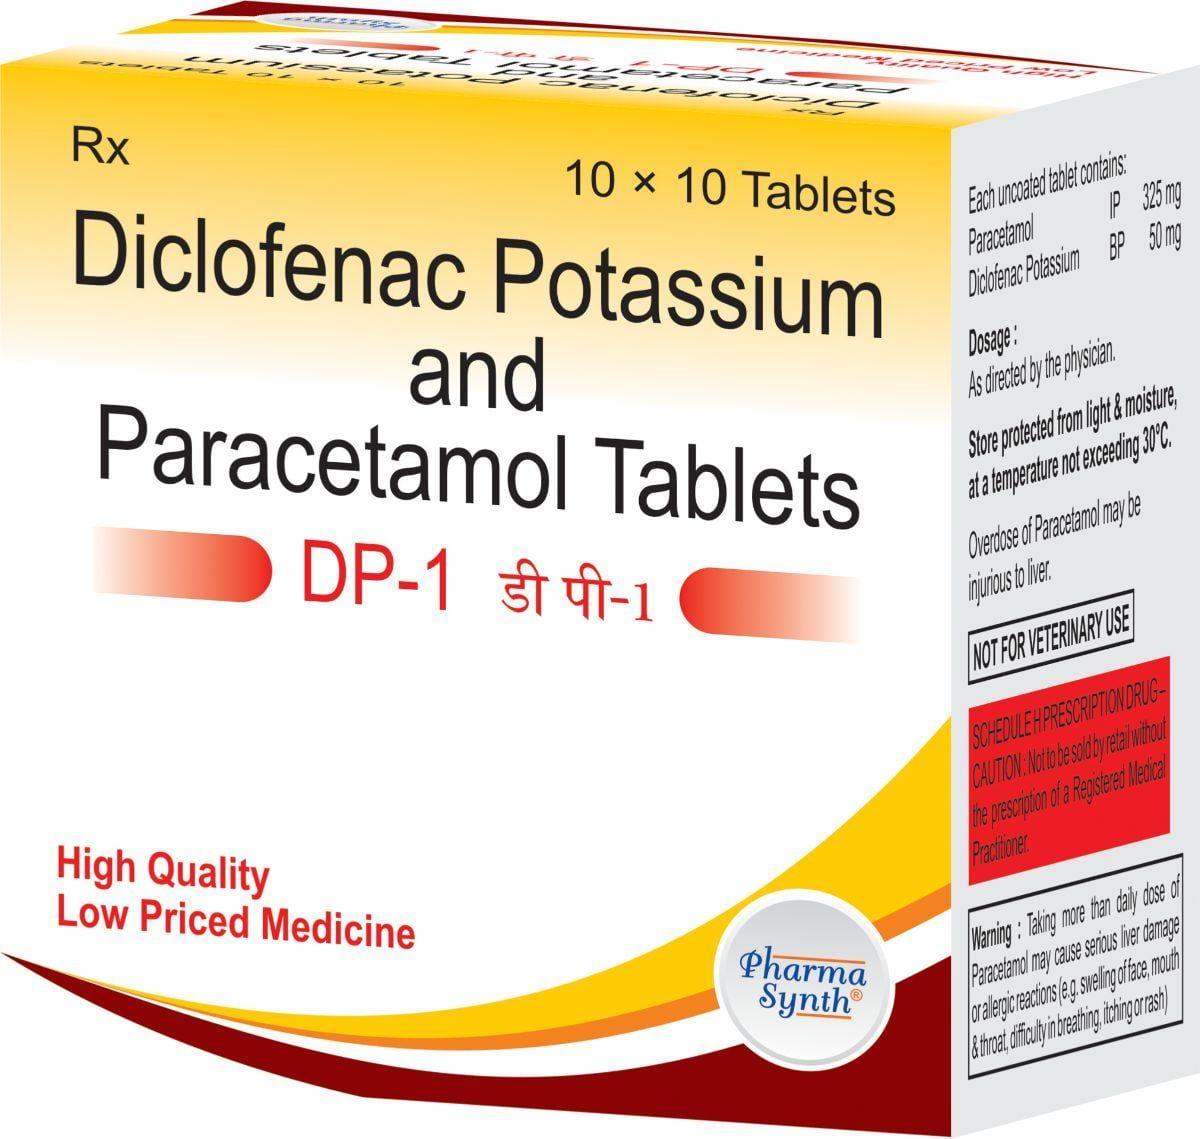 DP-1 Tablets